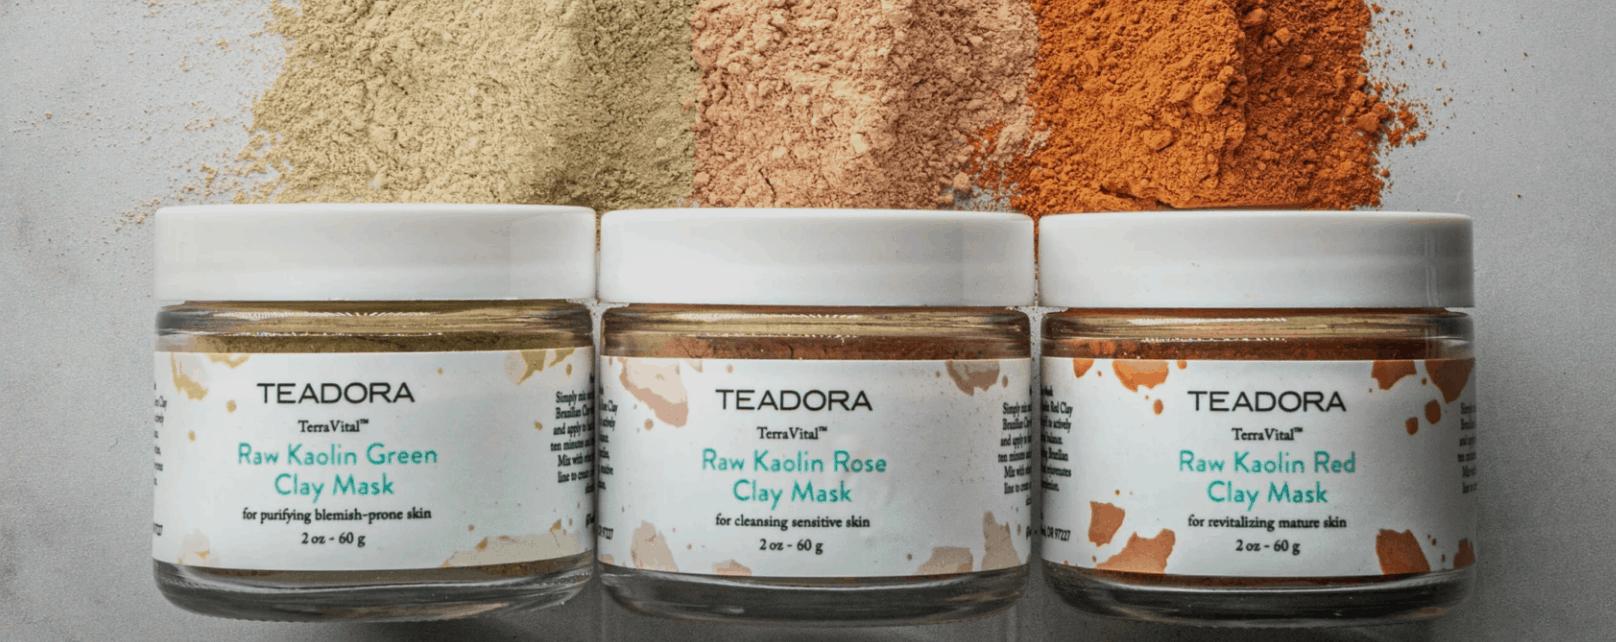 Brazilian Kaolin Clay By TEADORA CBD